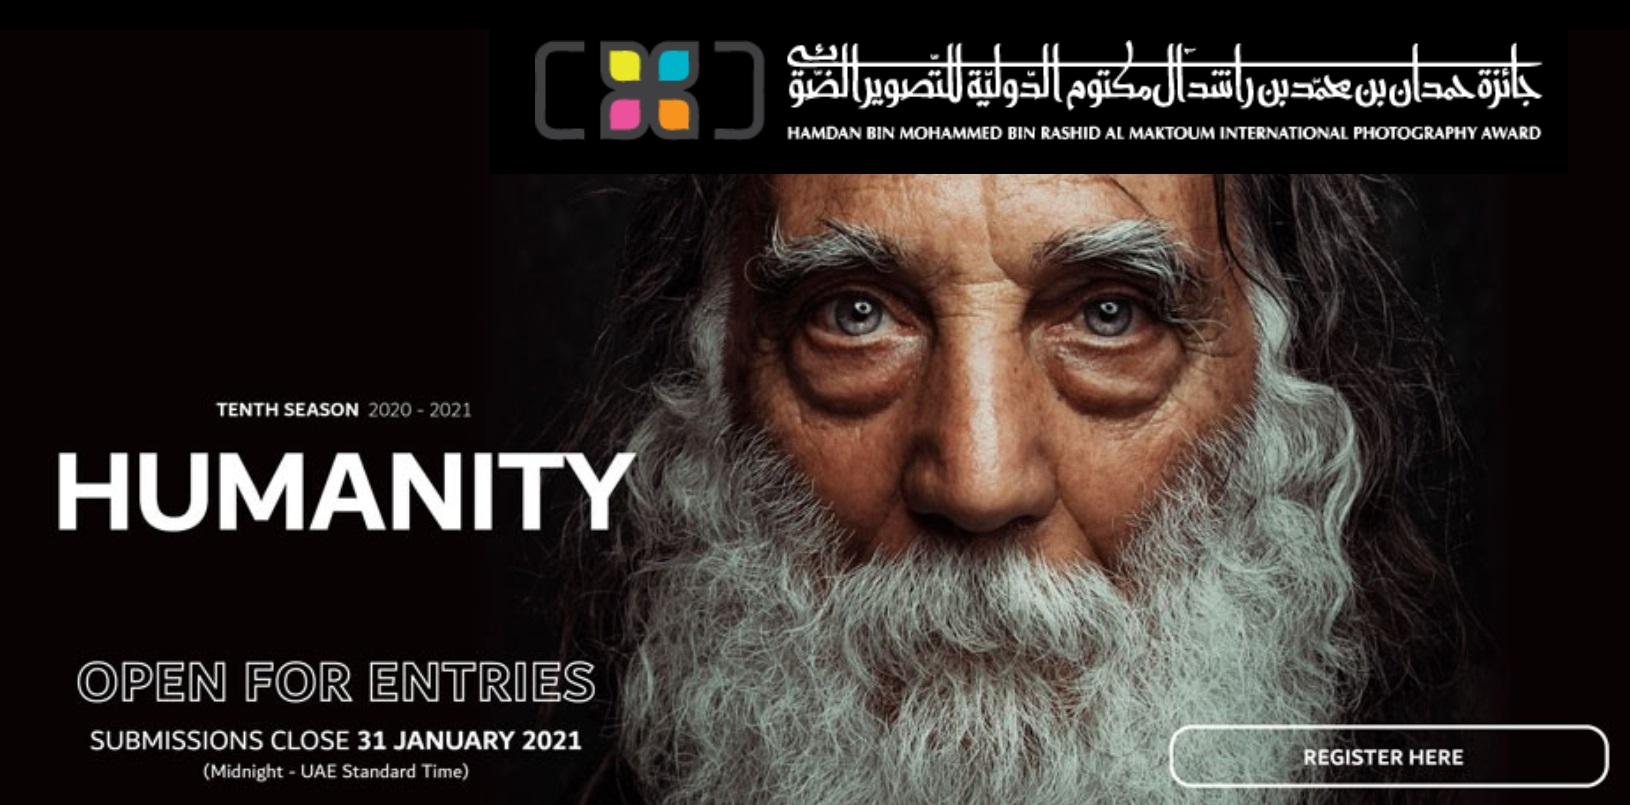 HIPA 2020-2021 International Photography Award - logo